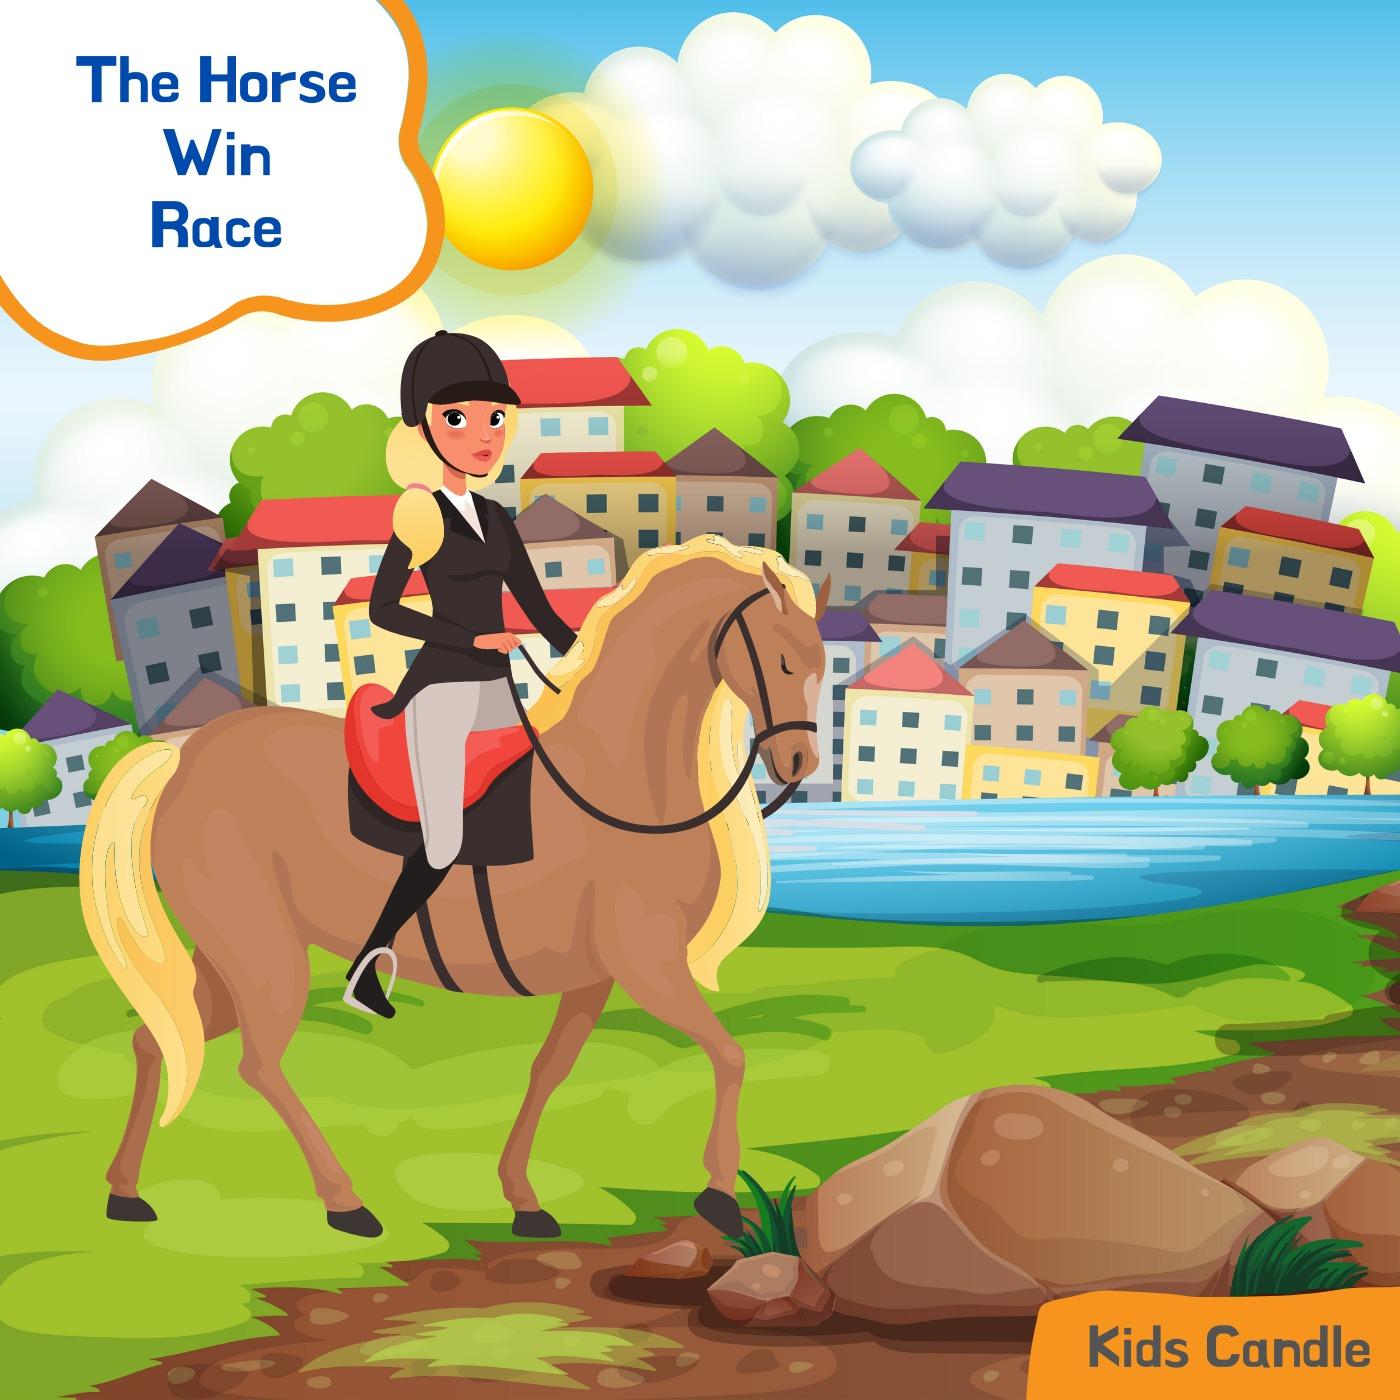 Cinderella: The Horse Win Race